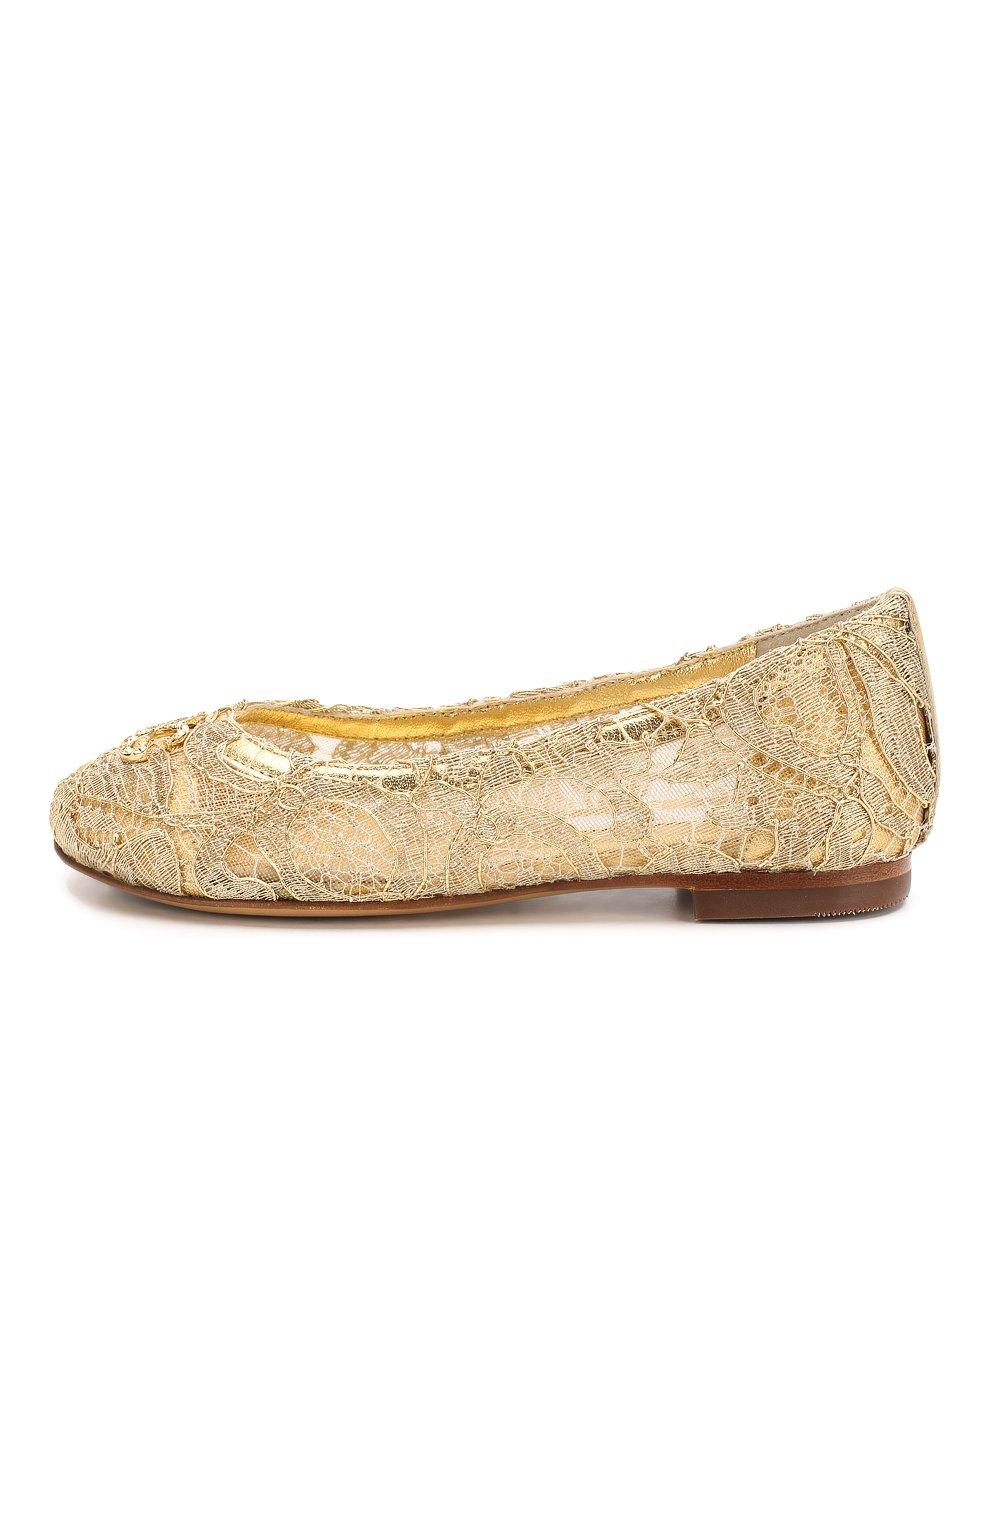 Детские балетки DOLCE & GABBANA золотого цвета, арт. D10430/AJ653/24-28 | Фото 2